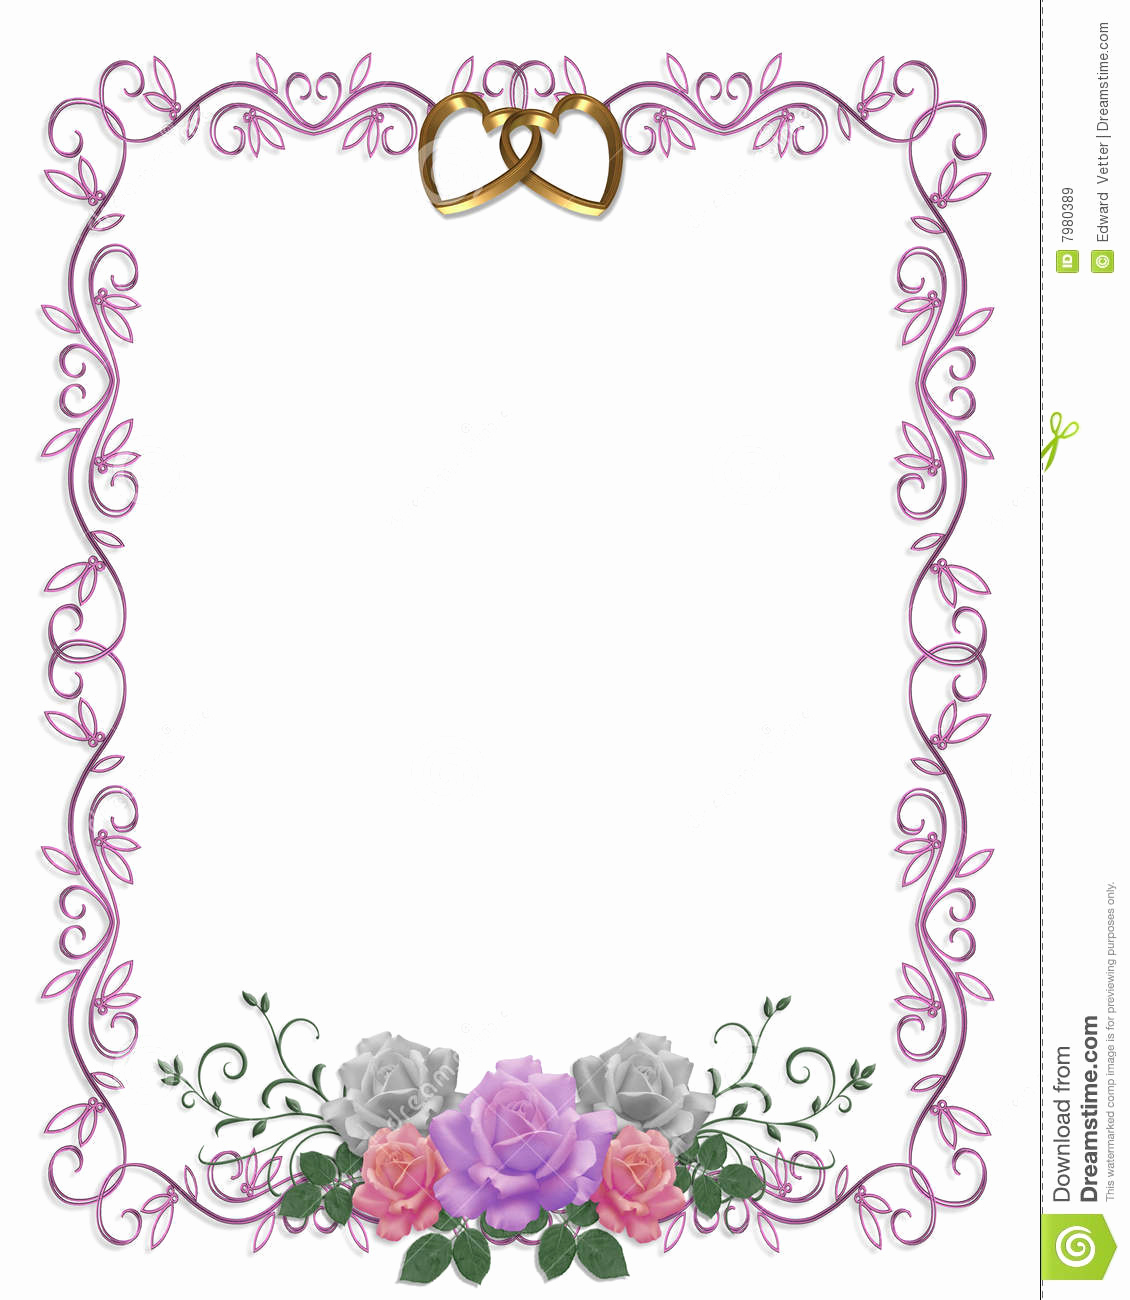 Wedding Invitation Borders Design Best Of Wedding Invitation Floral Border Roses Stock Illustration